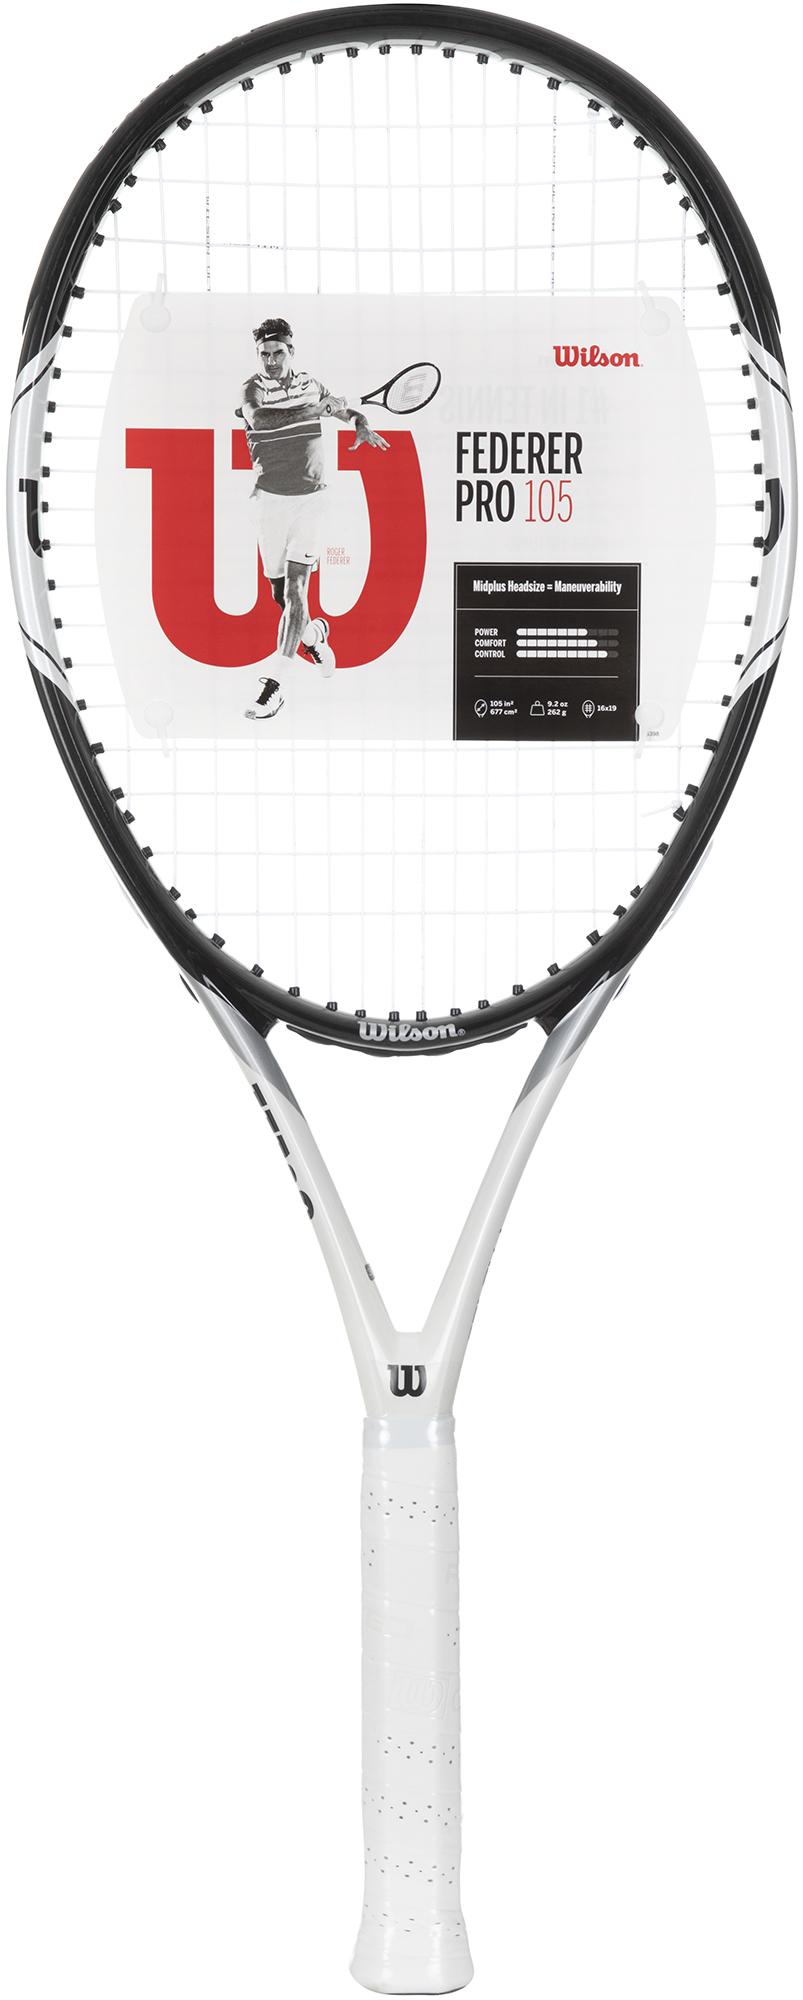 Wilson Ракетка для большого тенниса Wilson FEDERER PRO 105 27, размер 3 wilson ракетка для большого тенниса детская wilson roger federer 23 размер без размера